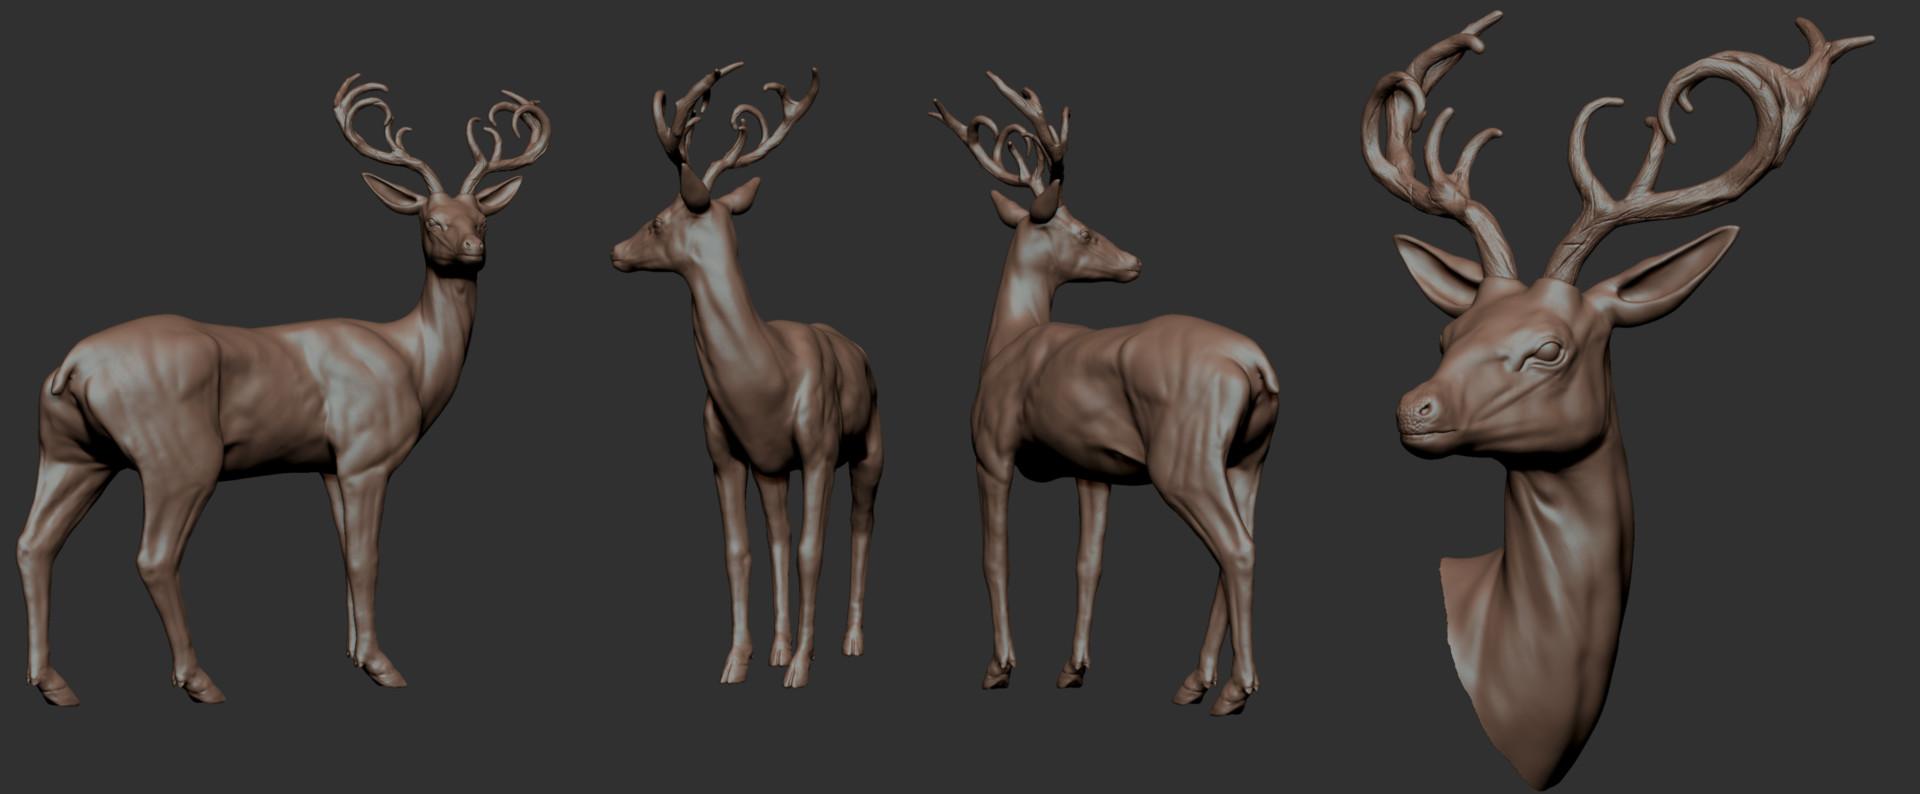 ArtStation - Deer - Anatomy Study, Lucas Gallo